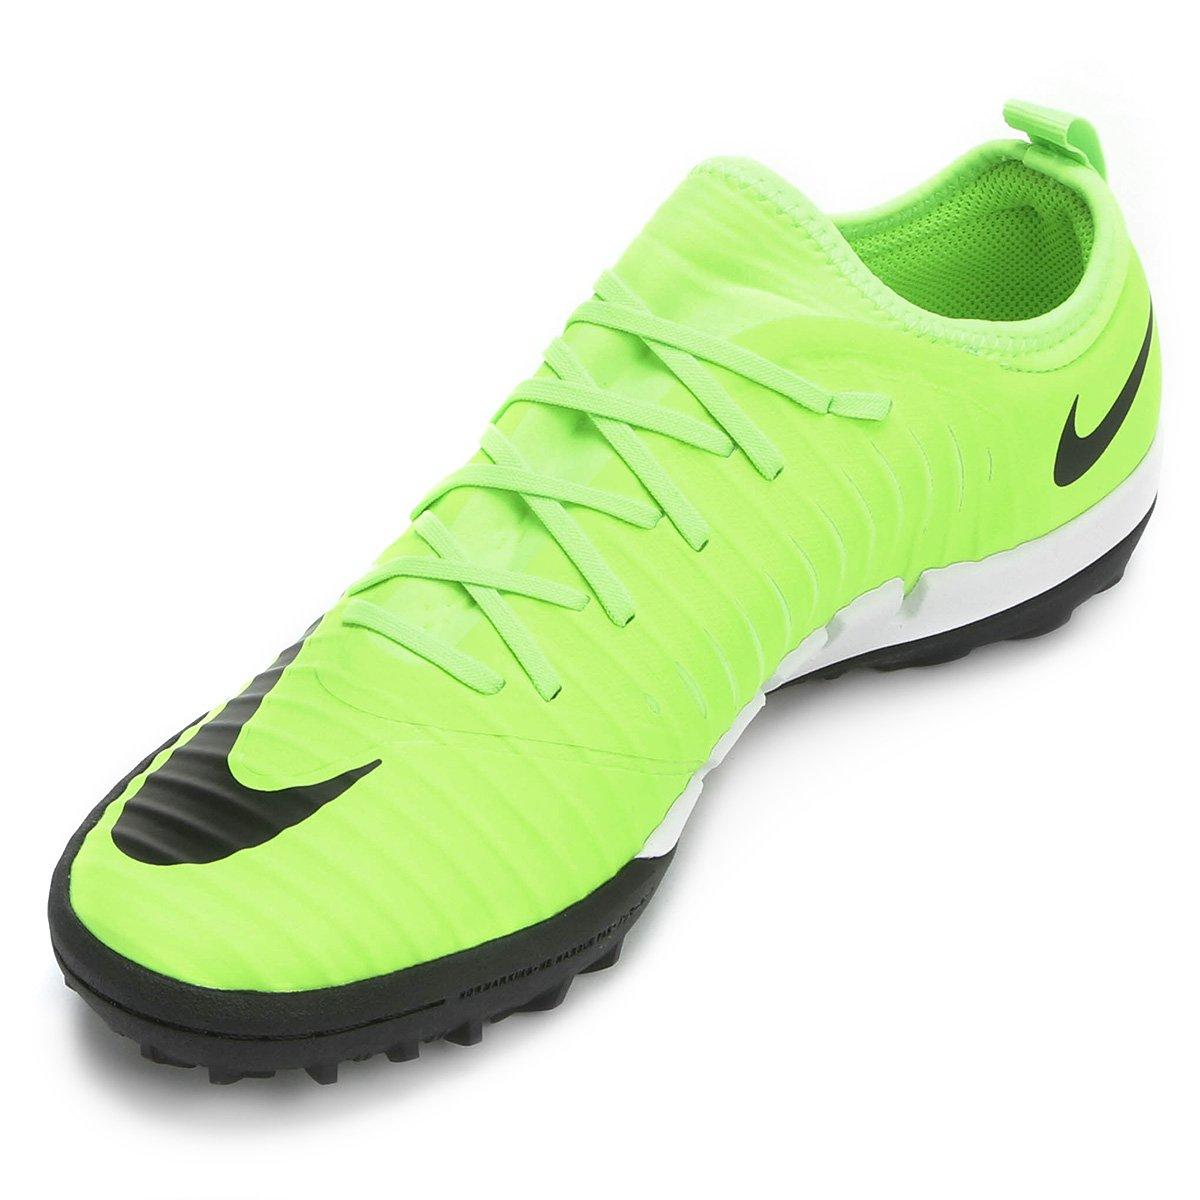 b6104814f4 Chuteira Society Nike Mercurial Finale 2 TF - Verde e Preto - Compre ...